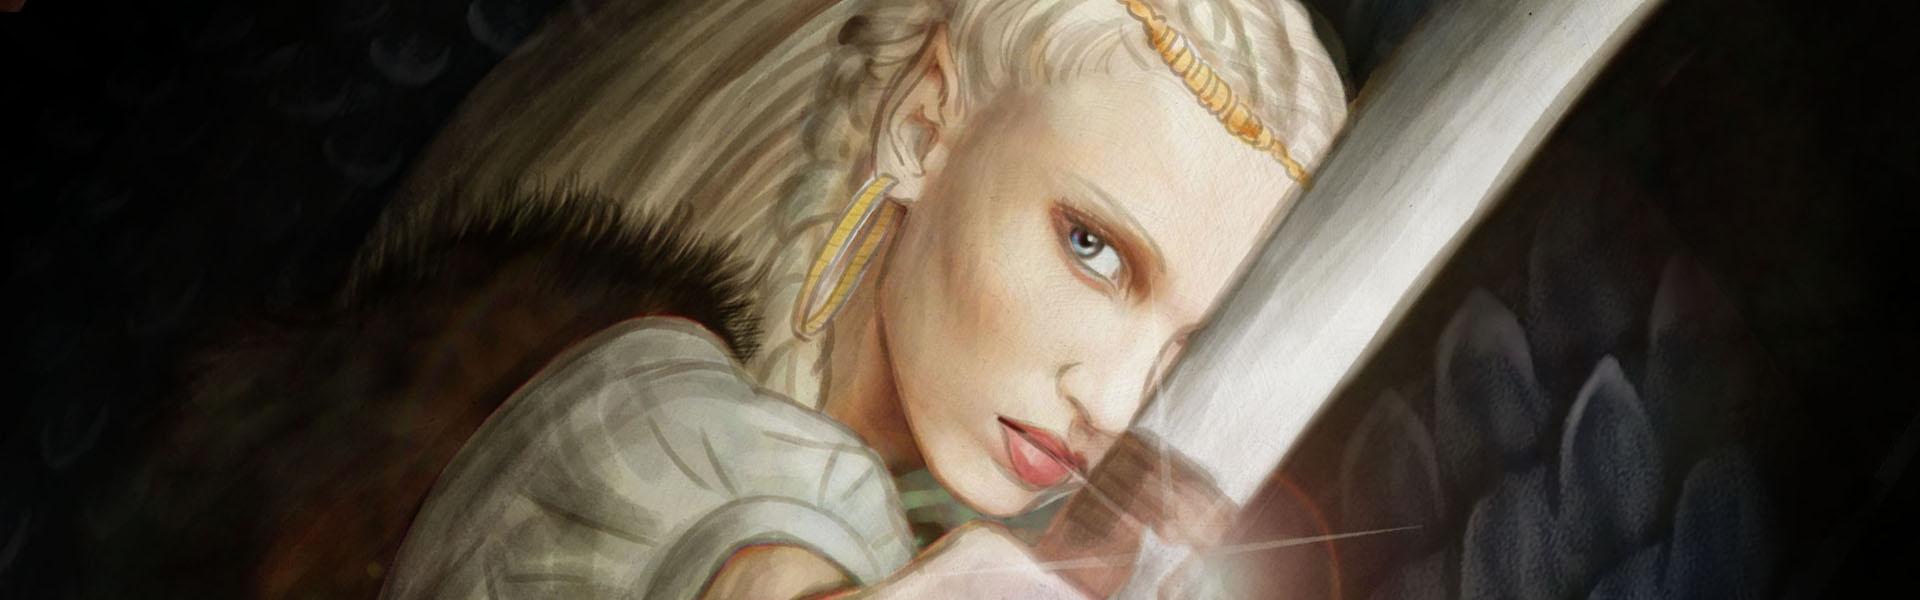 Sbatti l'elfa in copertina